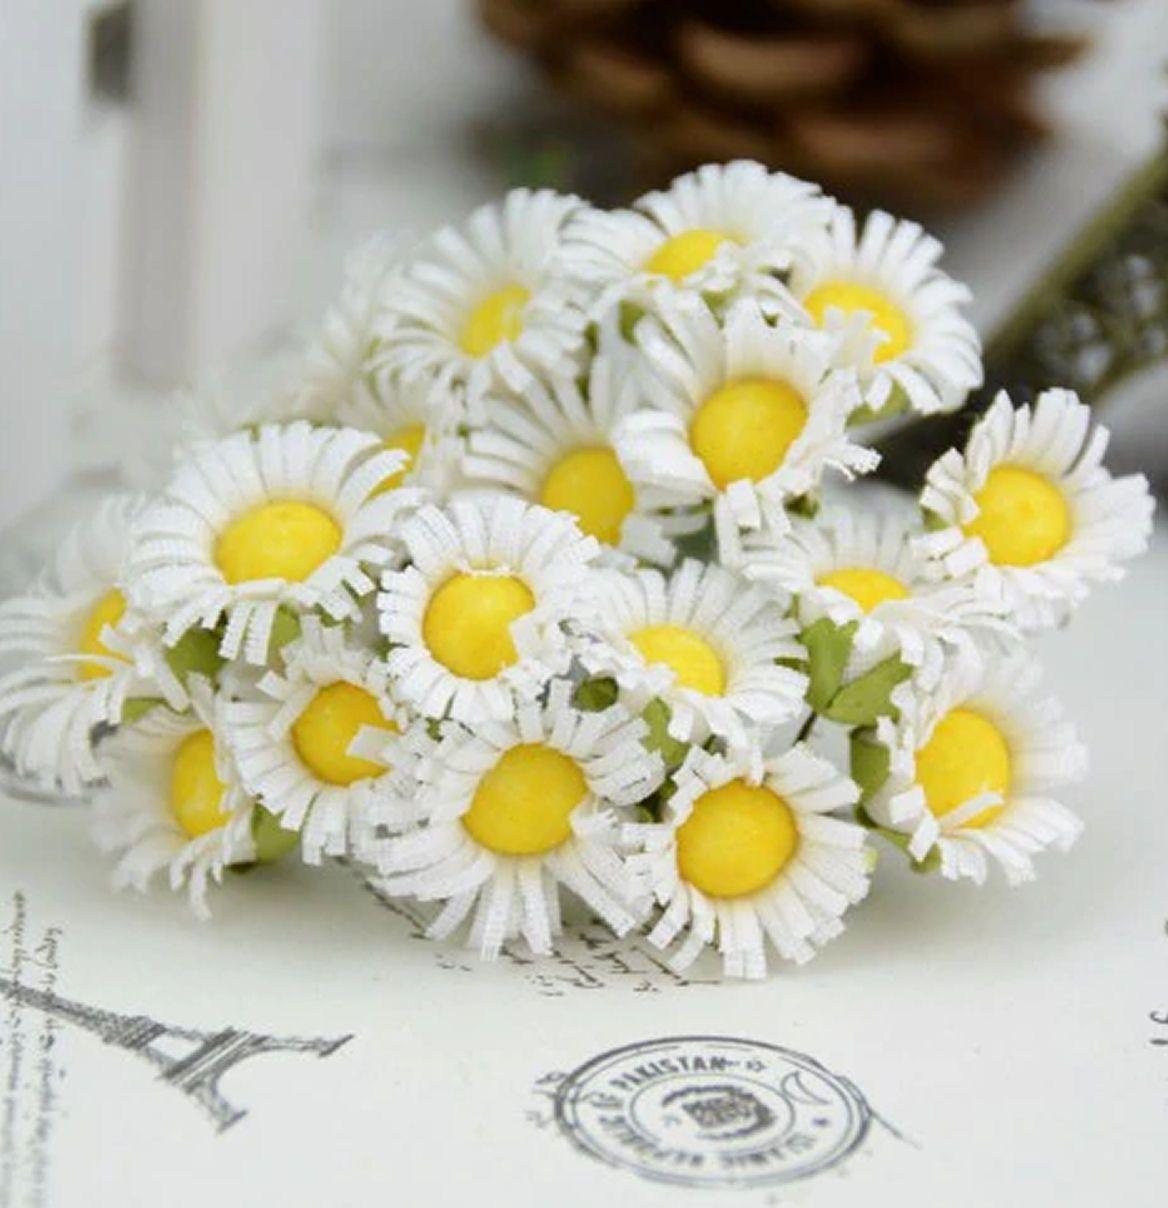 Artificial daisies floral flower craft embellishments.jpg